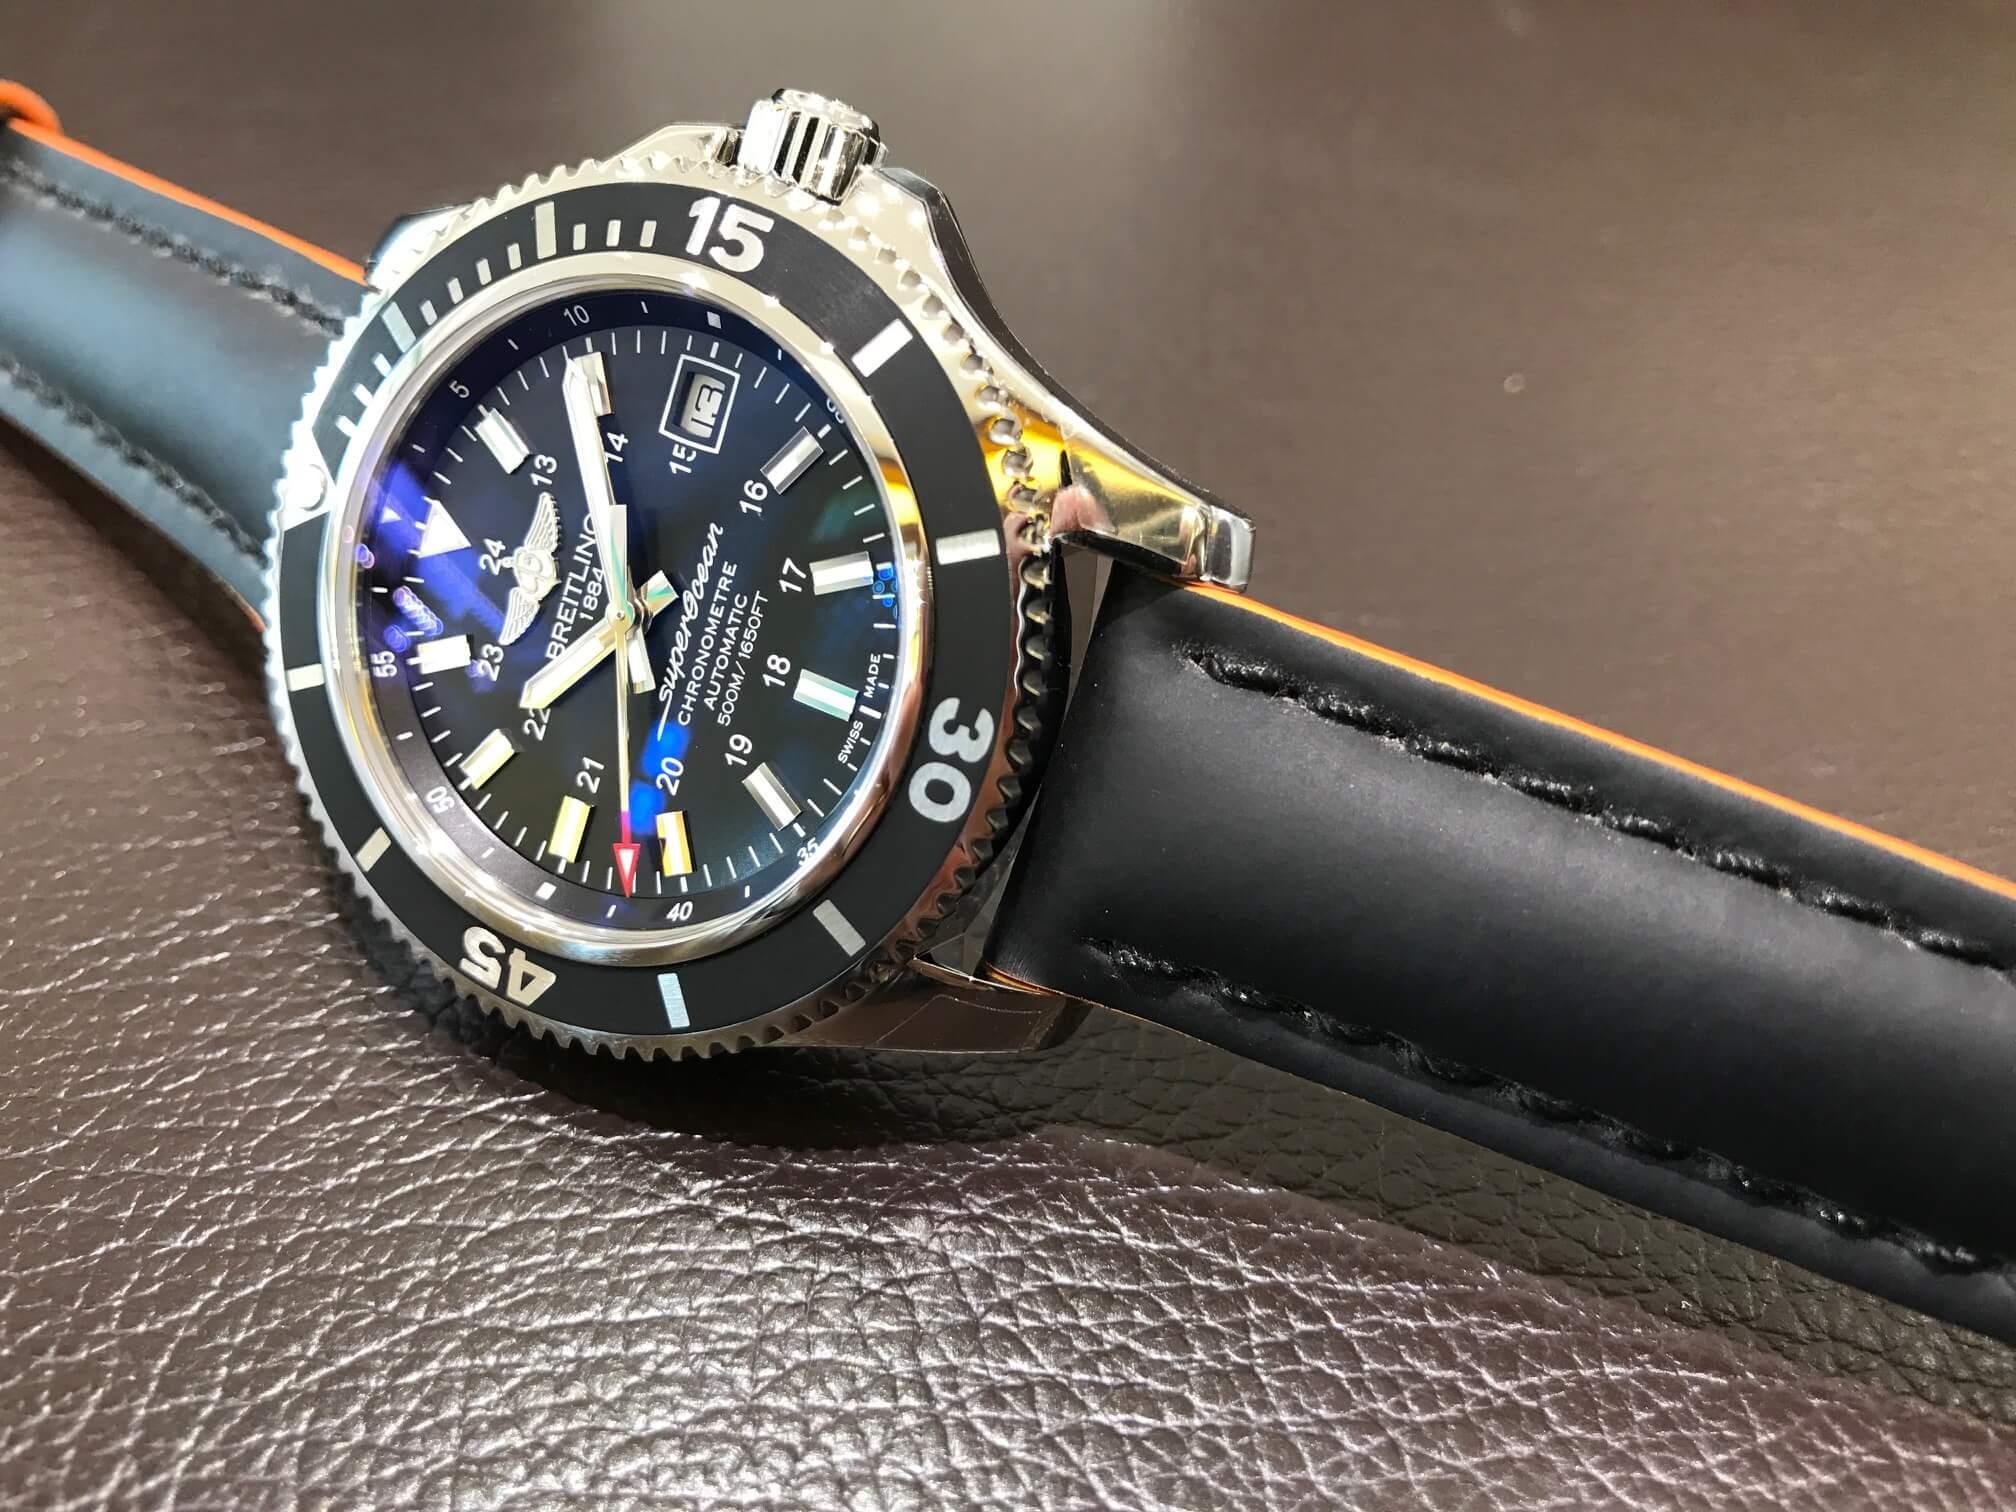 sale retailer 8dead 5812c スーパーオーシャン Ⅱ 42 の魅力 | 精光堂 -SEIKODO- 輸入時計 ...